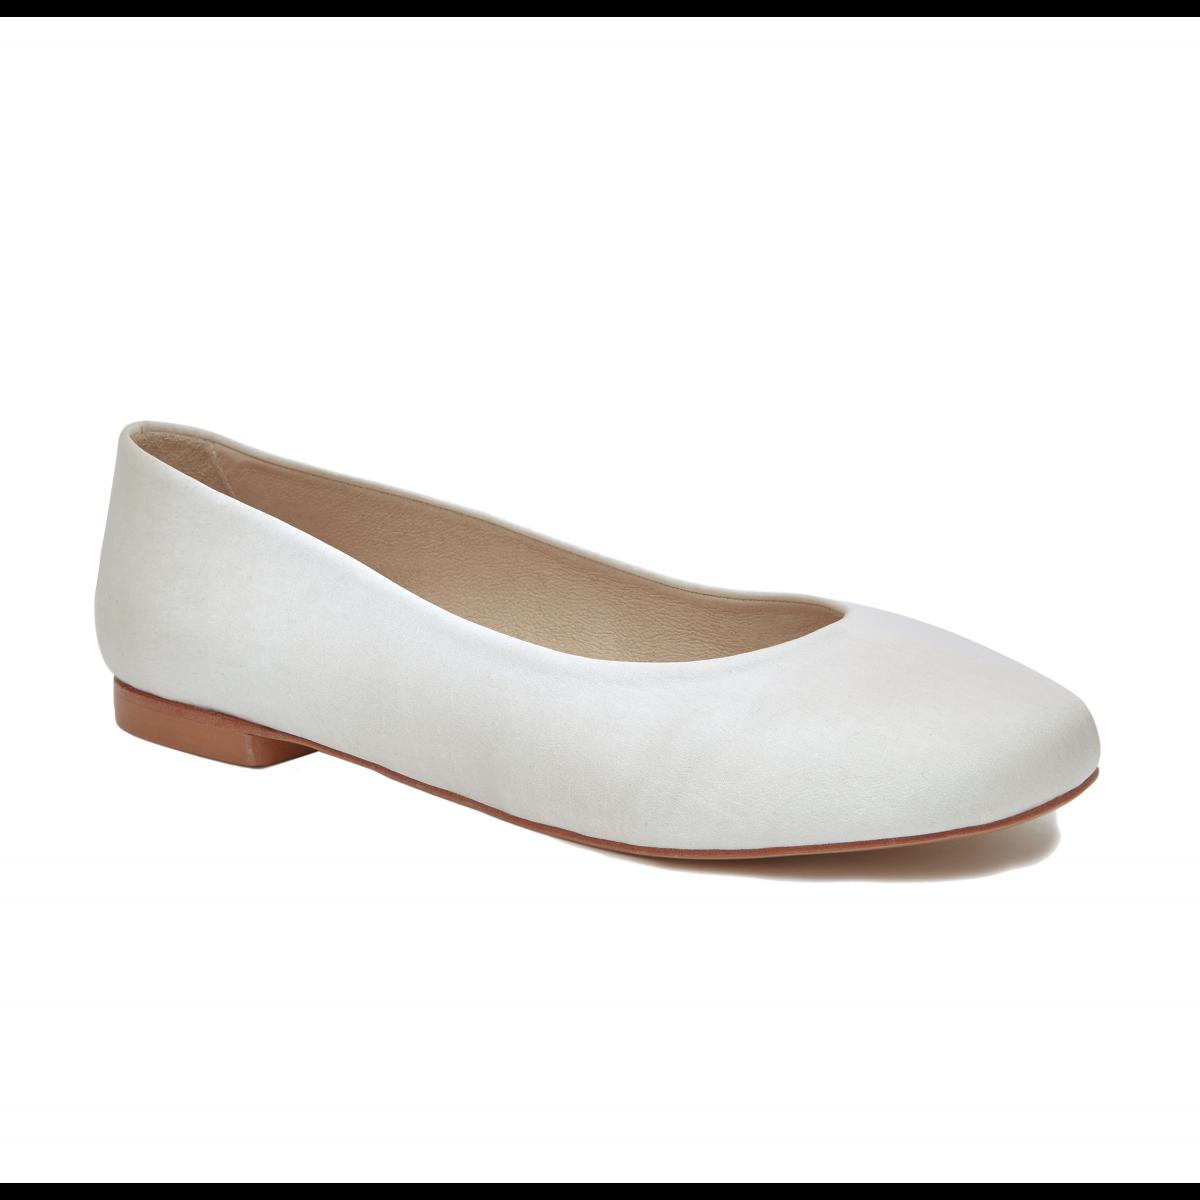 chaussures de mari e ballerine la montjuic mademoiselle rose chaussures de mari e sur mesure. Black Bedroom Furniture Sets. Home Design Ideas